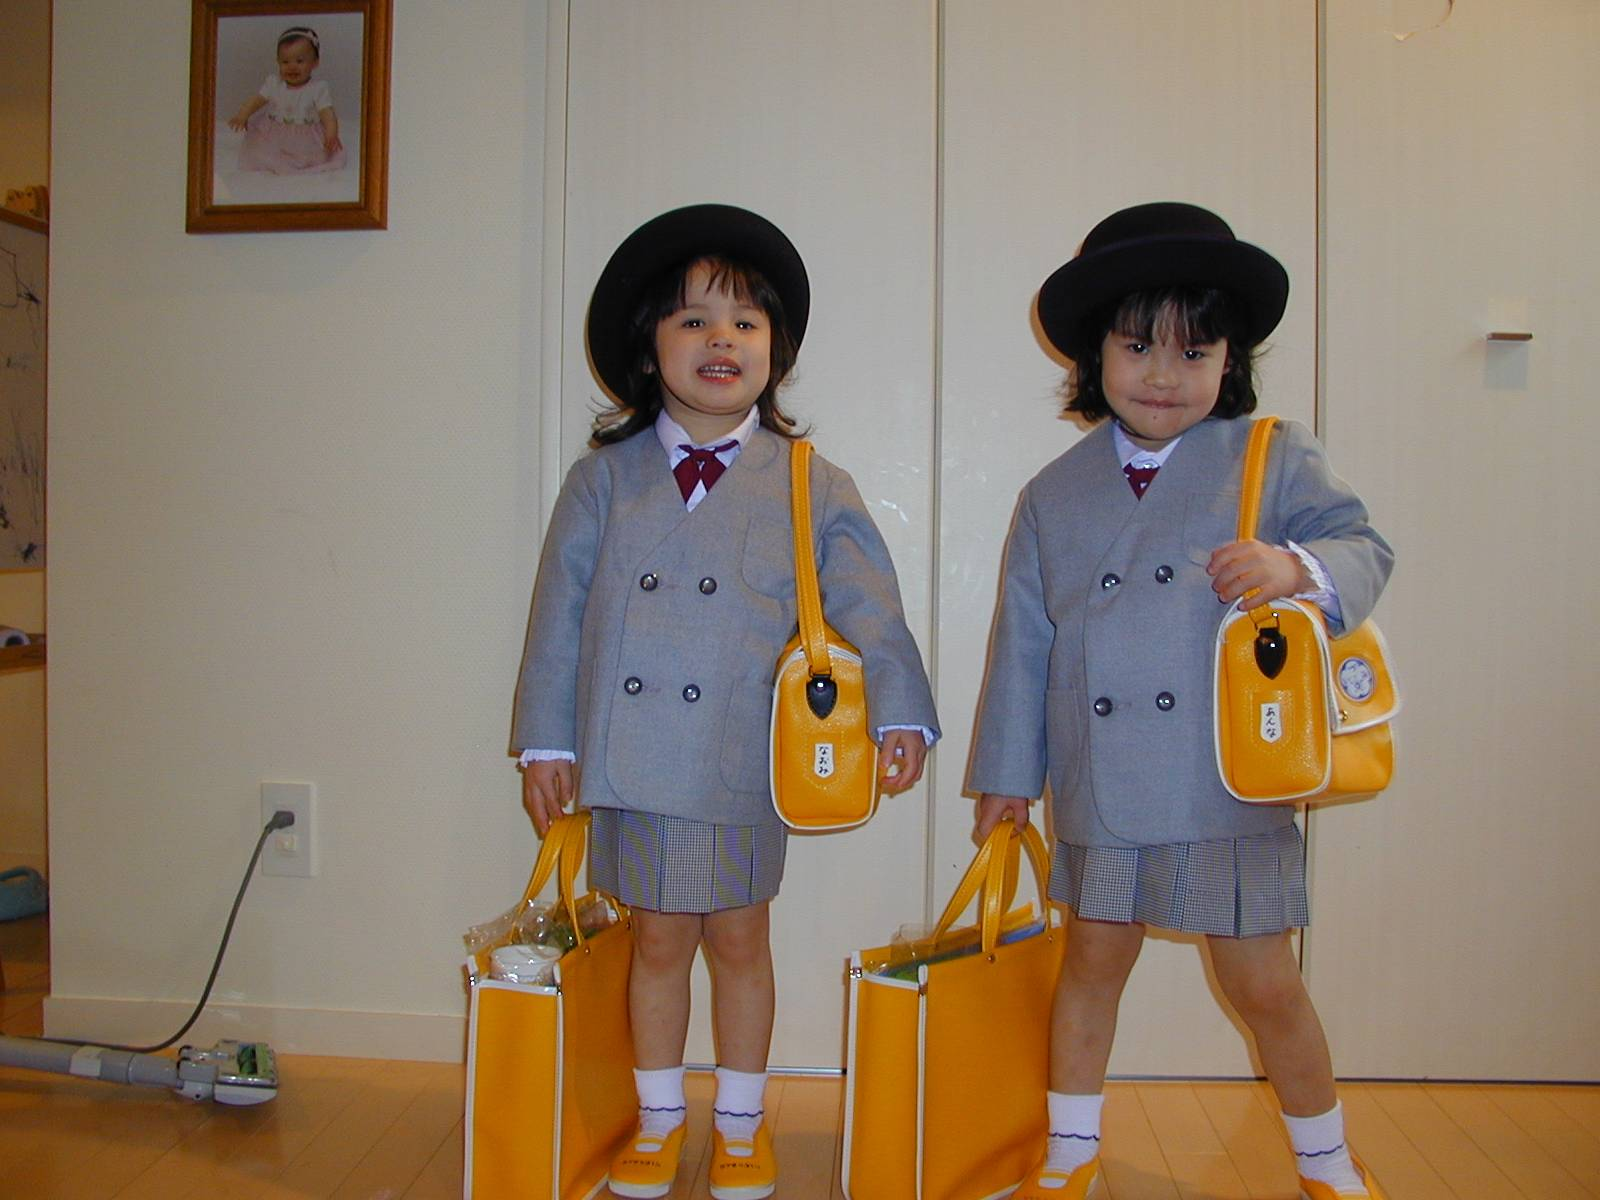 Naomi and Anna in school uniforms